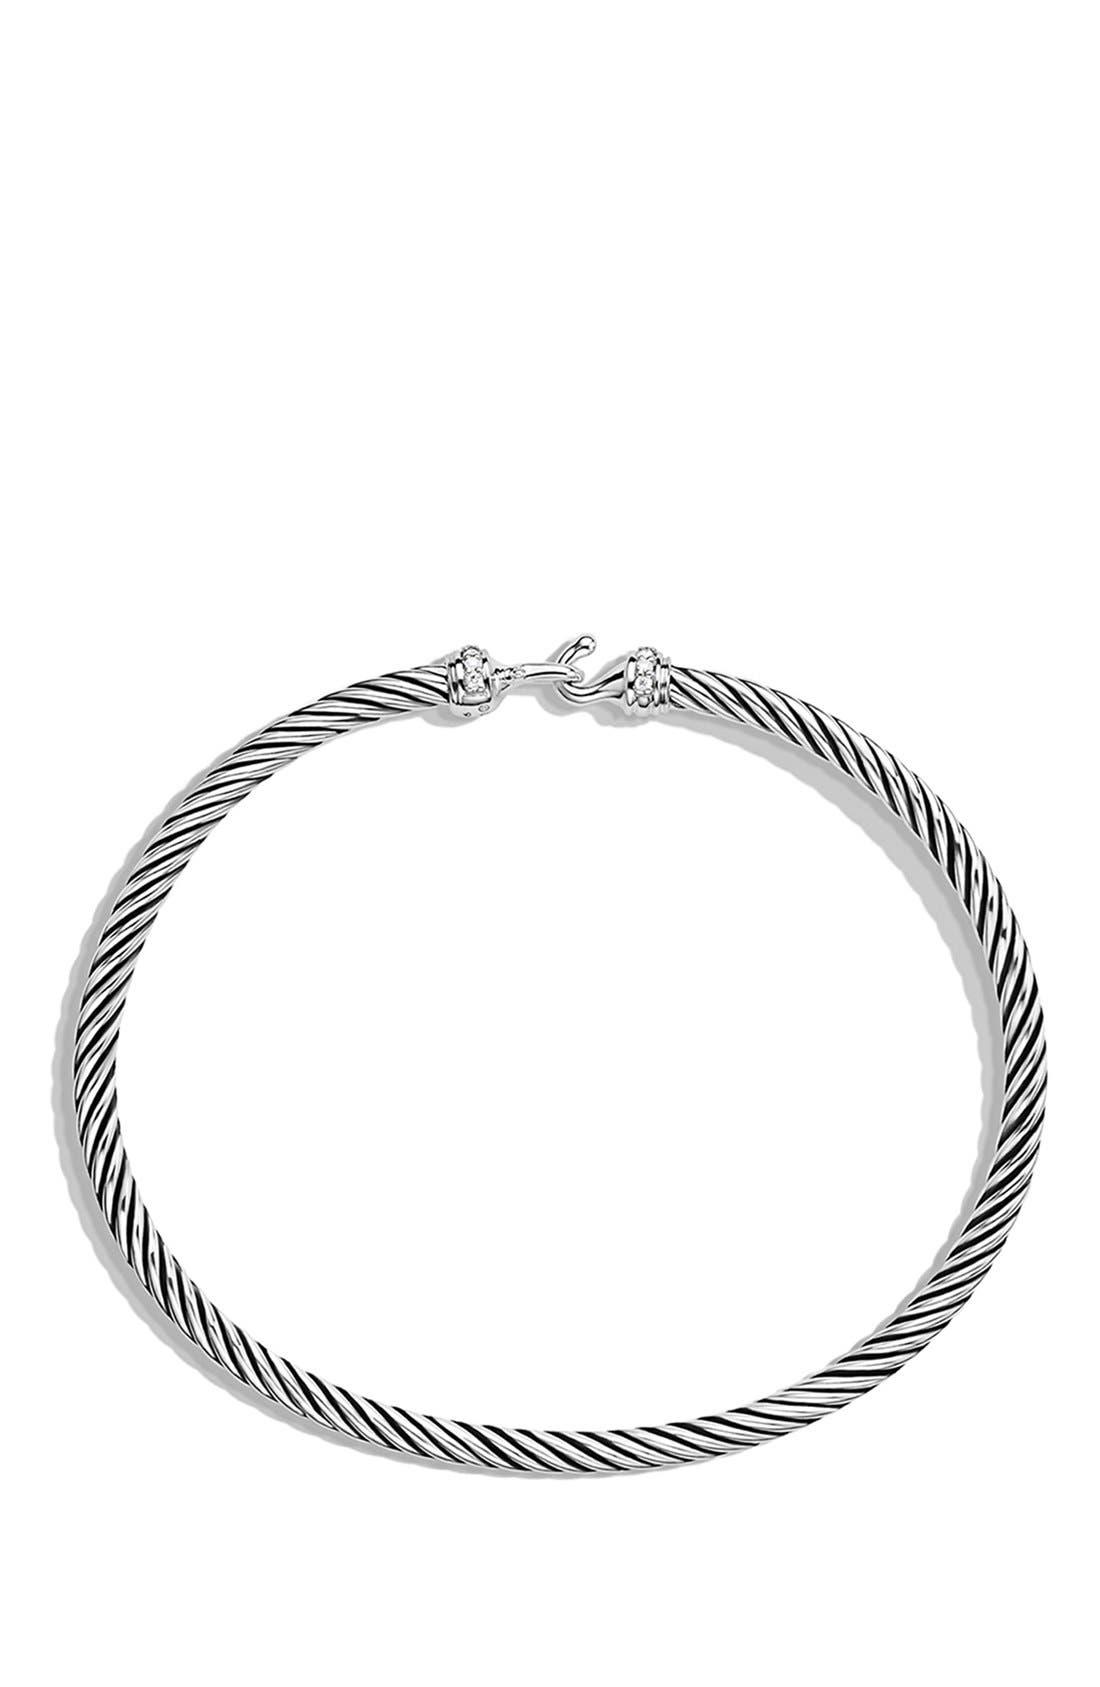 DAVID YURMAN,                             Cable Collectibles Buckle Bangle Bracelet with Diamonds, 3mm,                             Alternate thumbnail 2, color,                             DIAMOND